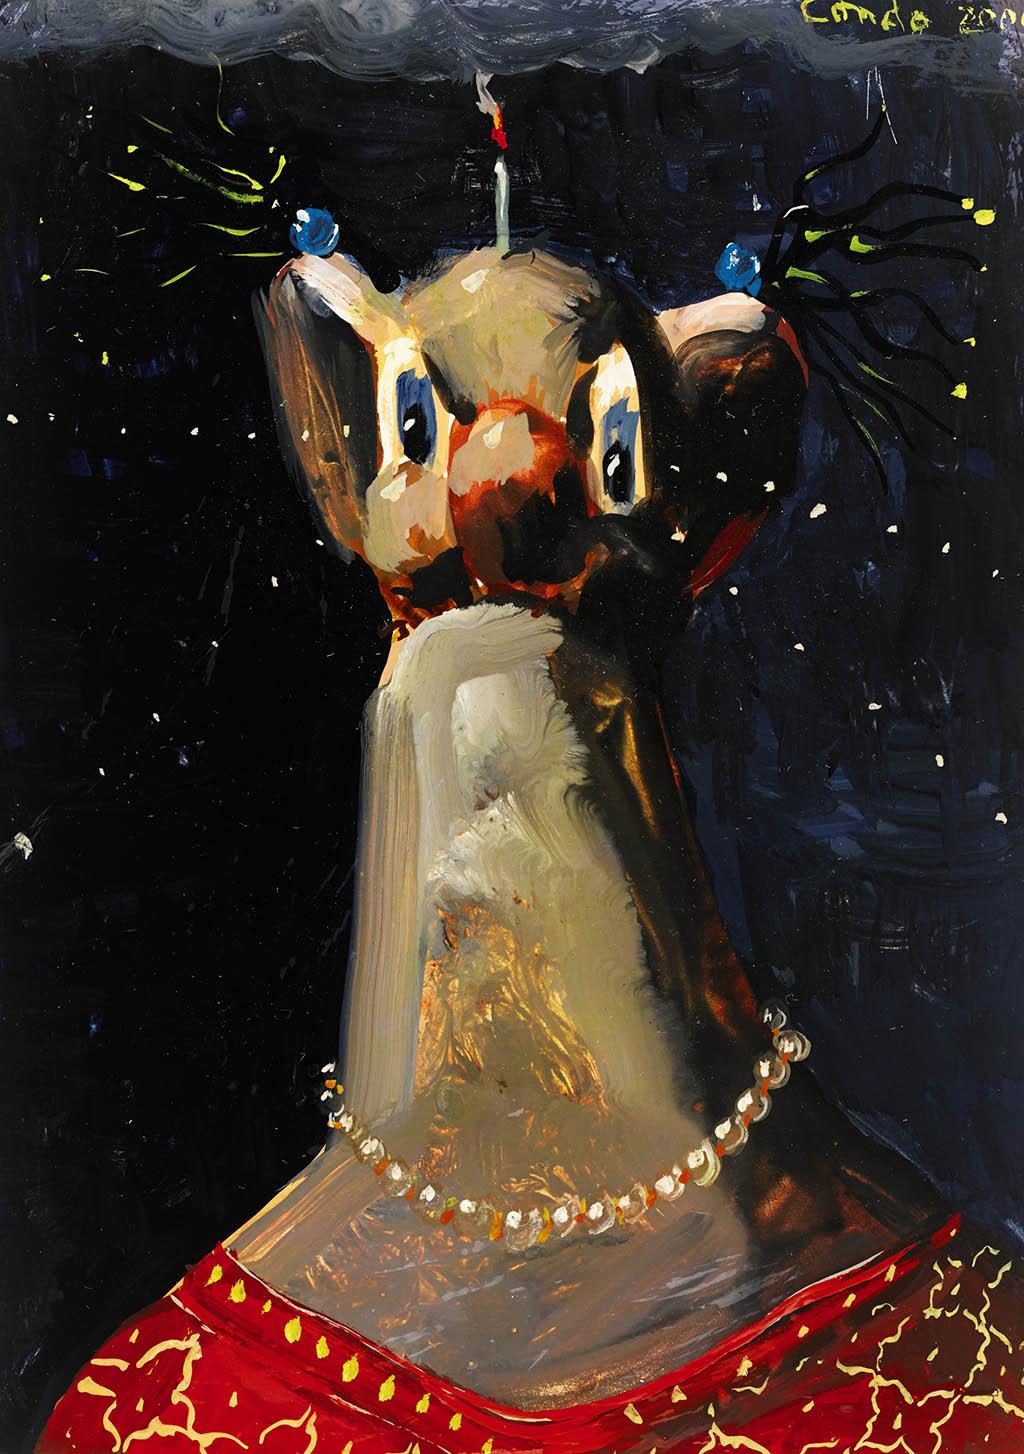 George Condo, Untitled, 2000